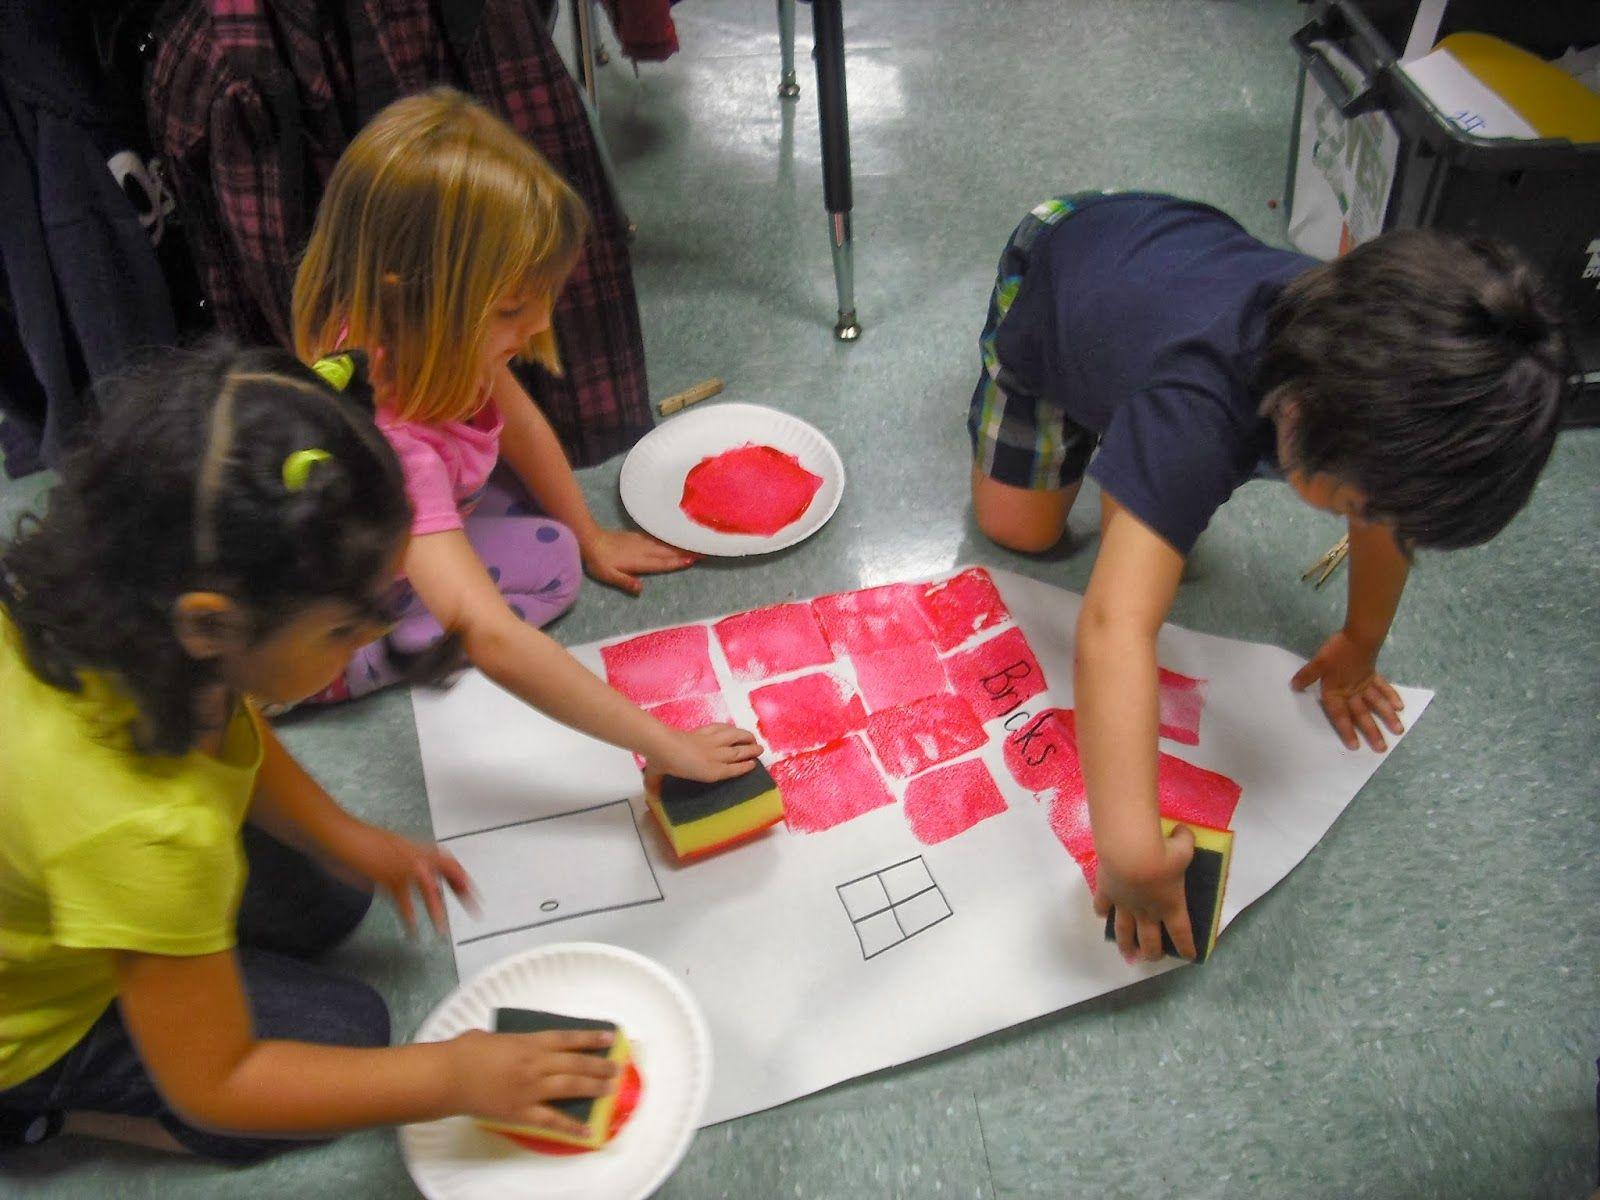 Three Little Pigs Sprinkles To Kindergarten